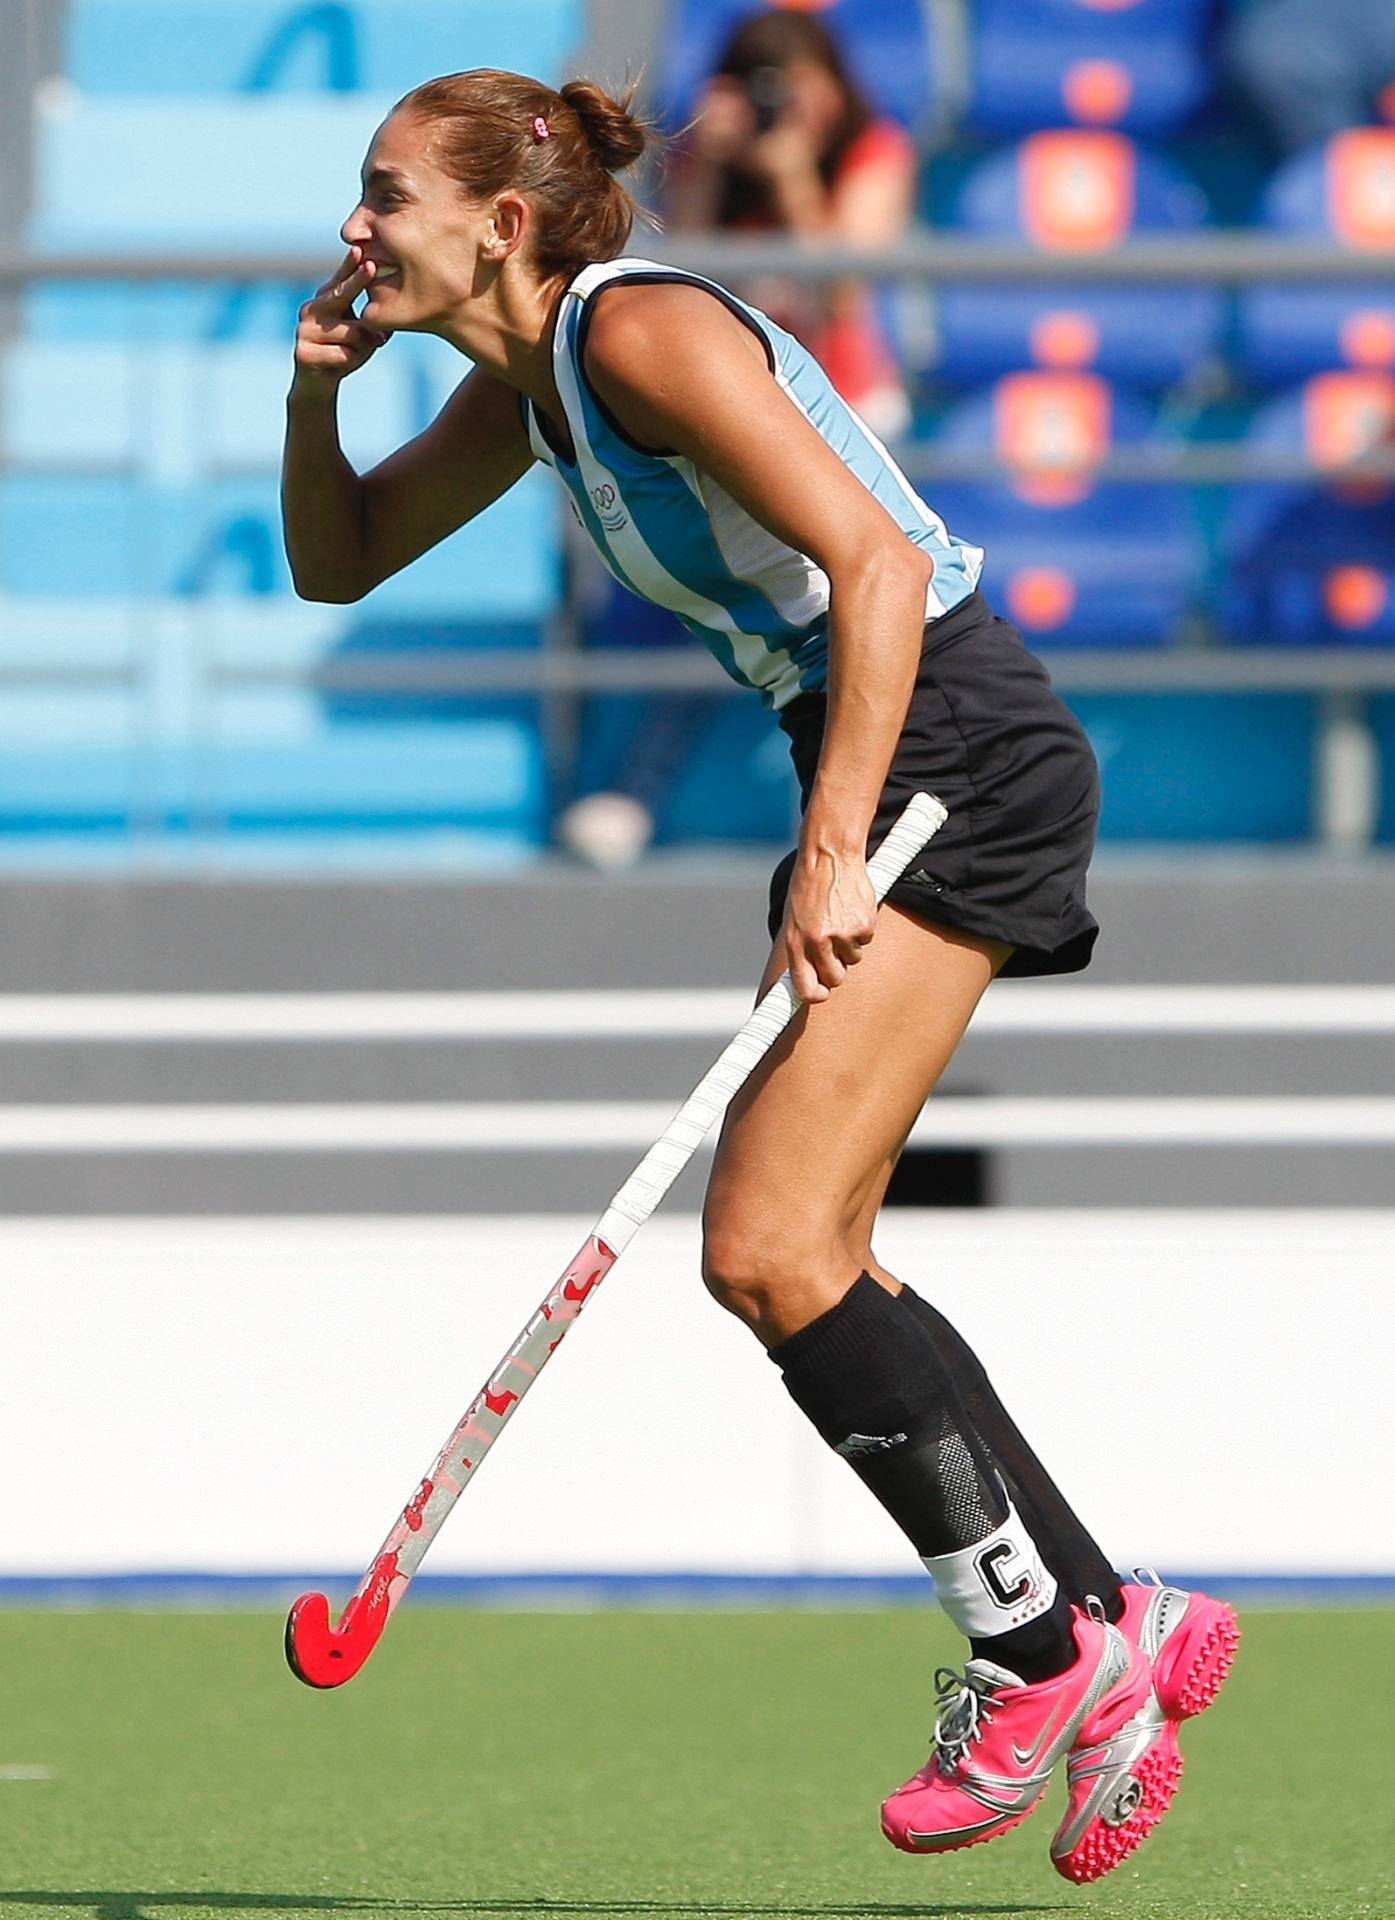 Luciana Aymar, musa do hóquei argentino, comemora gol contra o Canadá no Pan